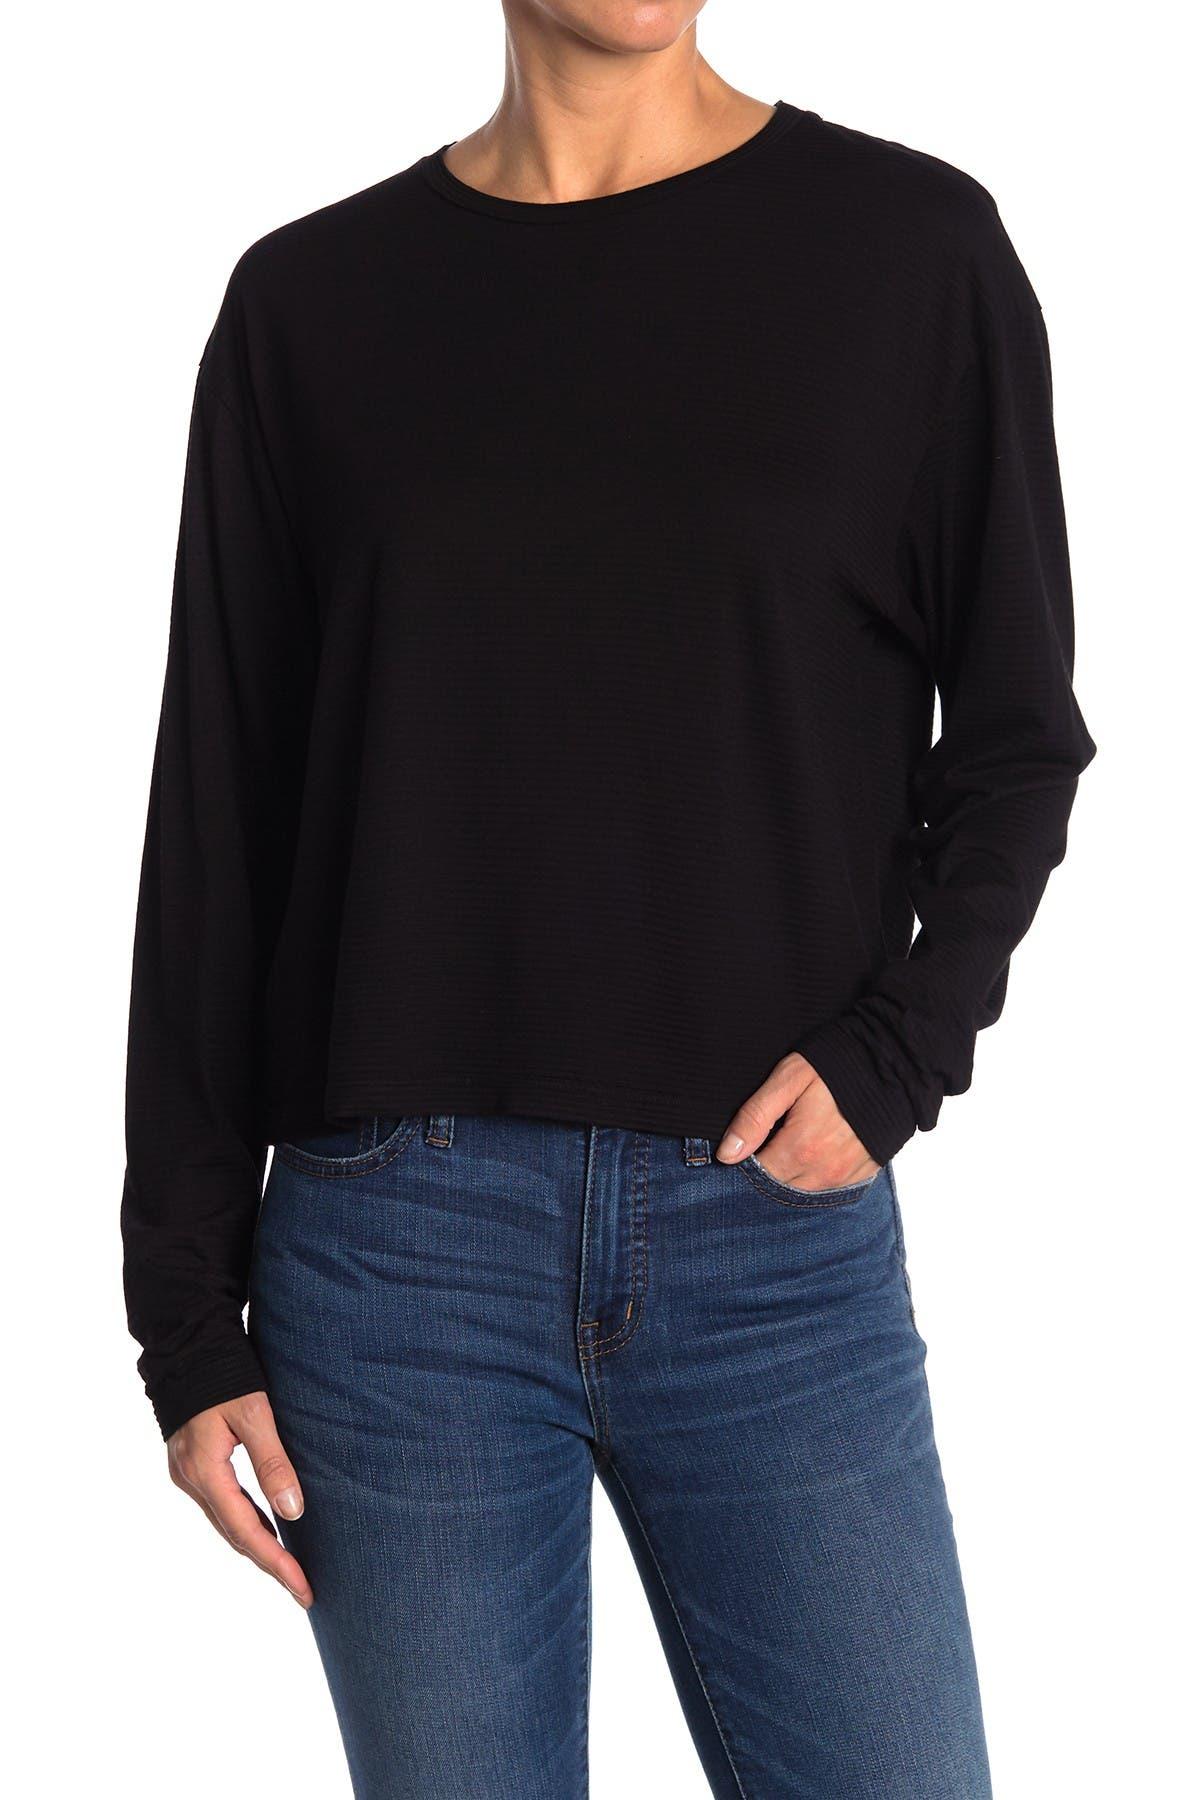 Image of Stateside Shadows Stripe Long Sleeve Jersey Top